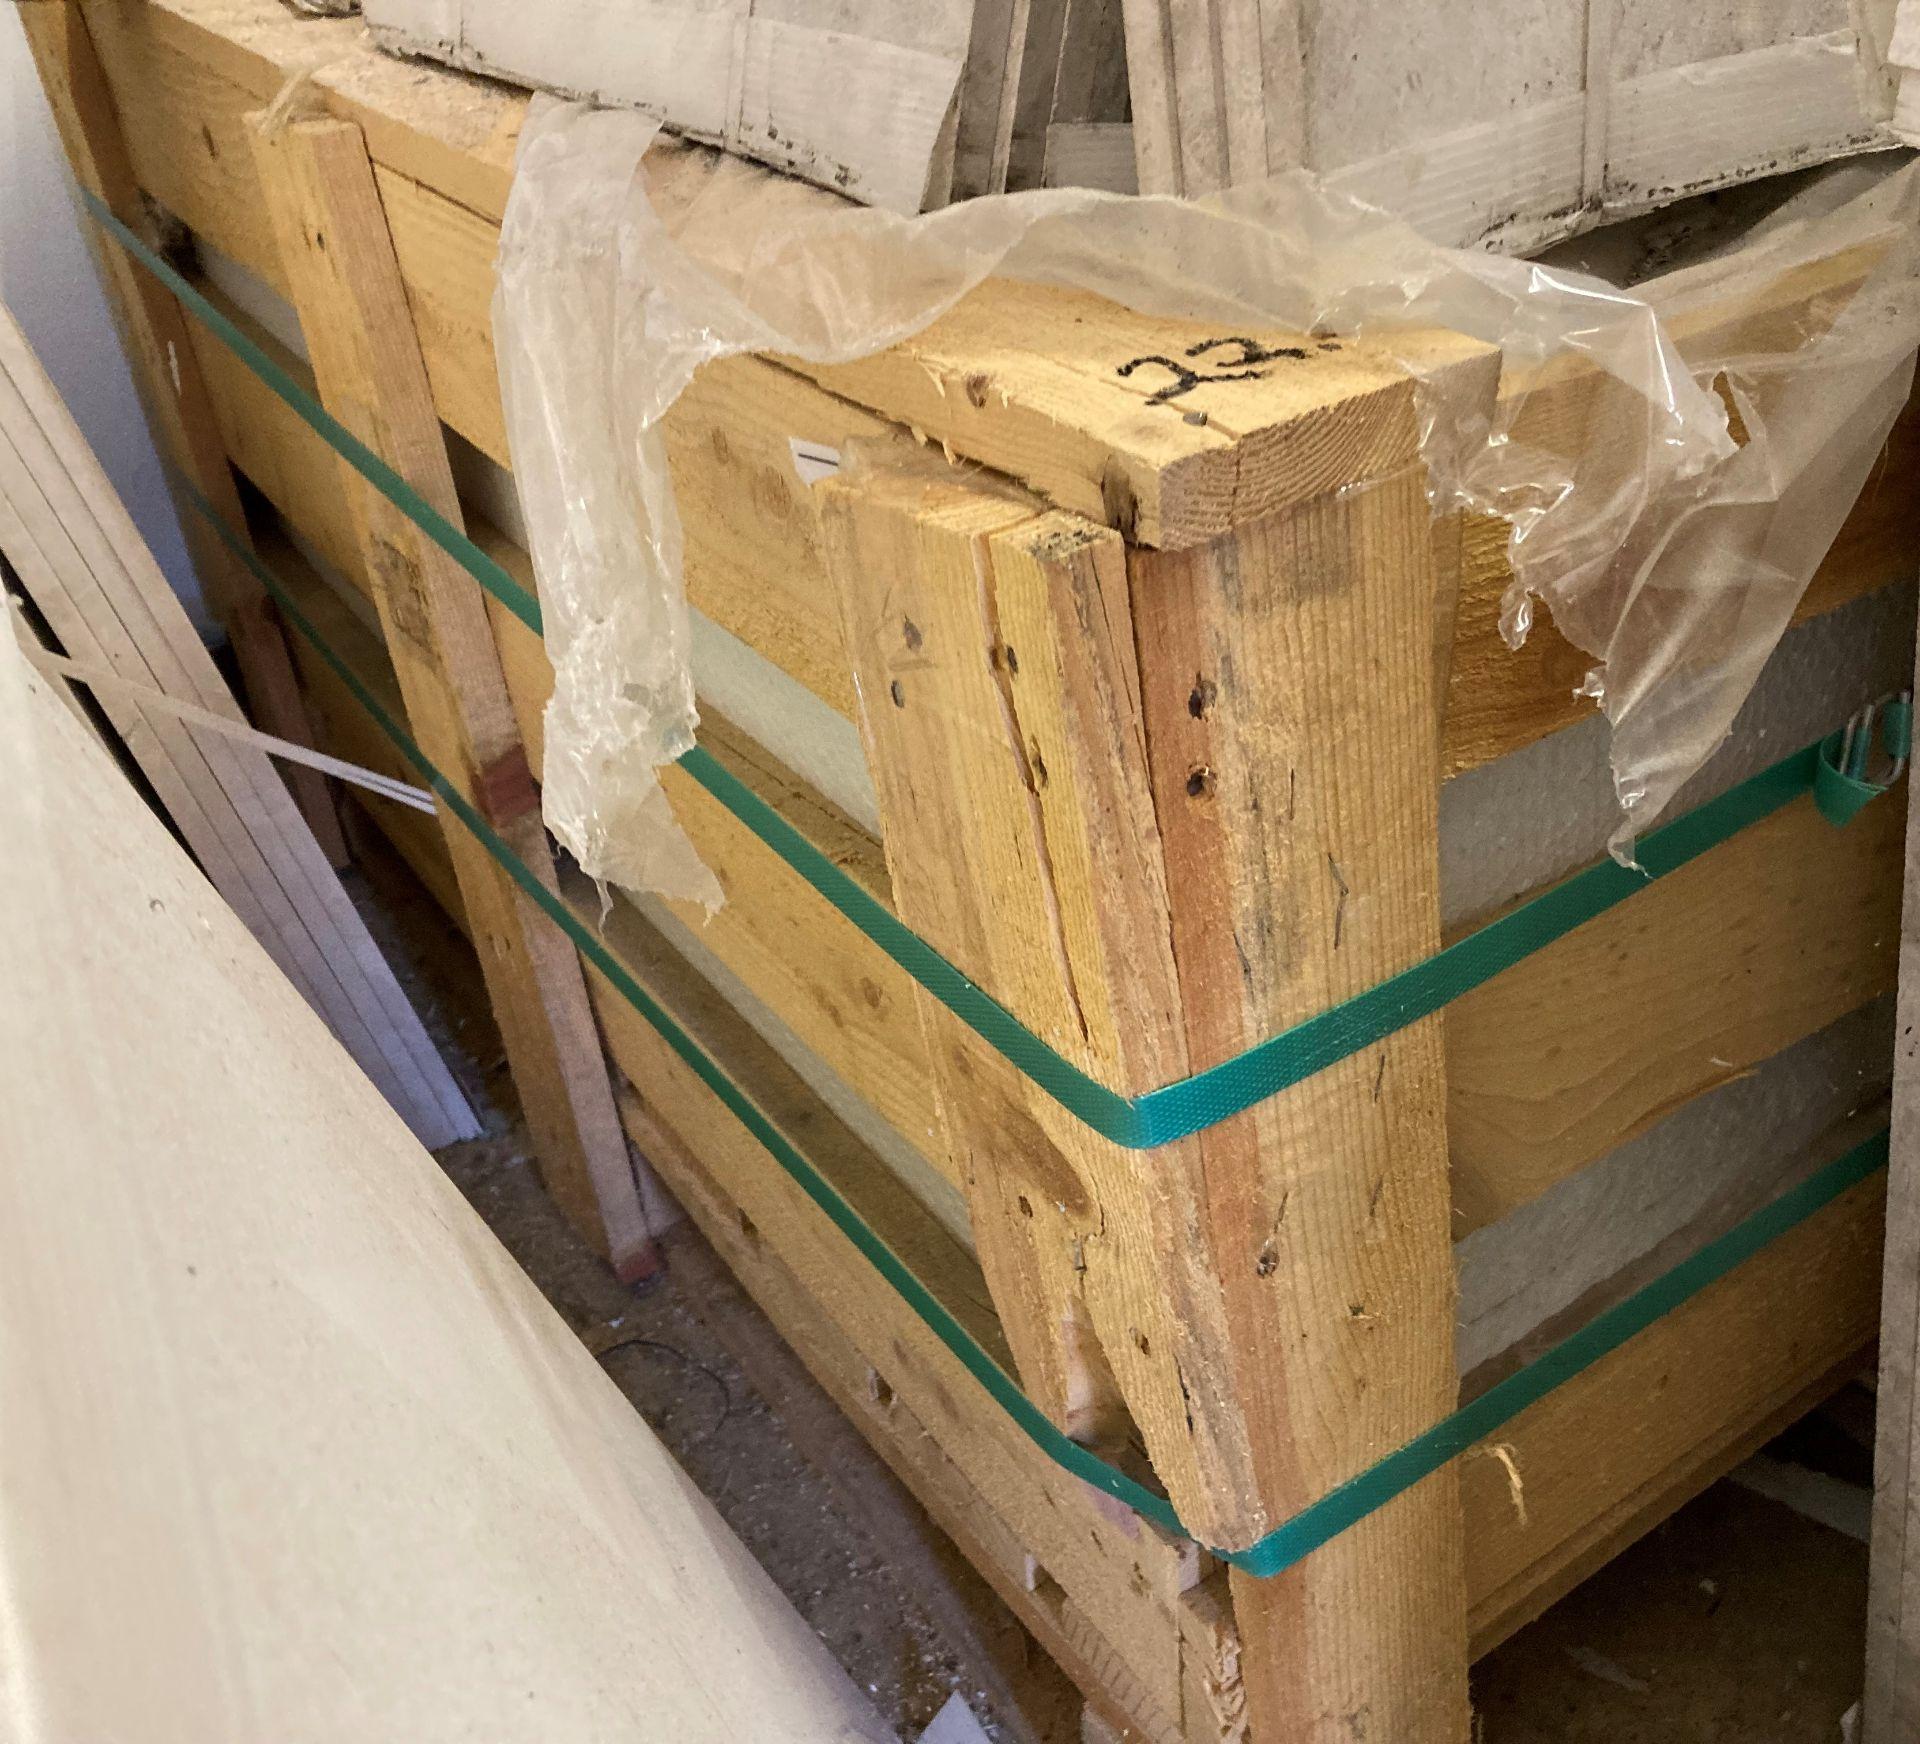 36 x packs of 4 Rosoni beige brushed tiles - 40 x 40 x 1. - Image 2 of 2